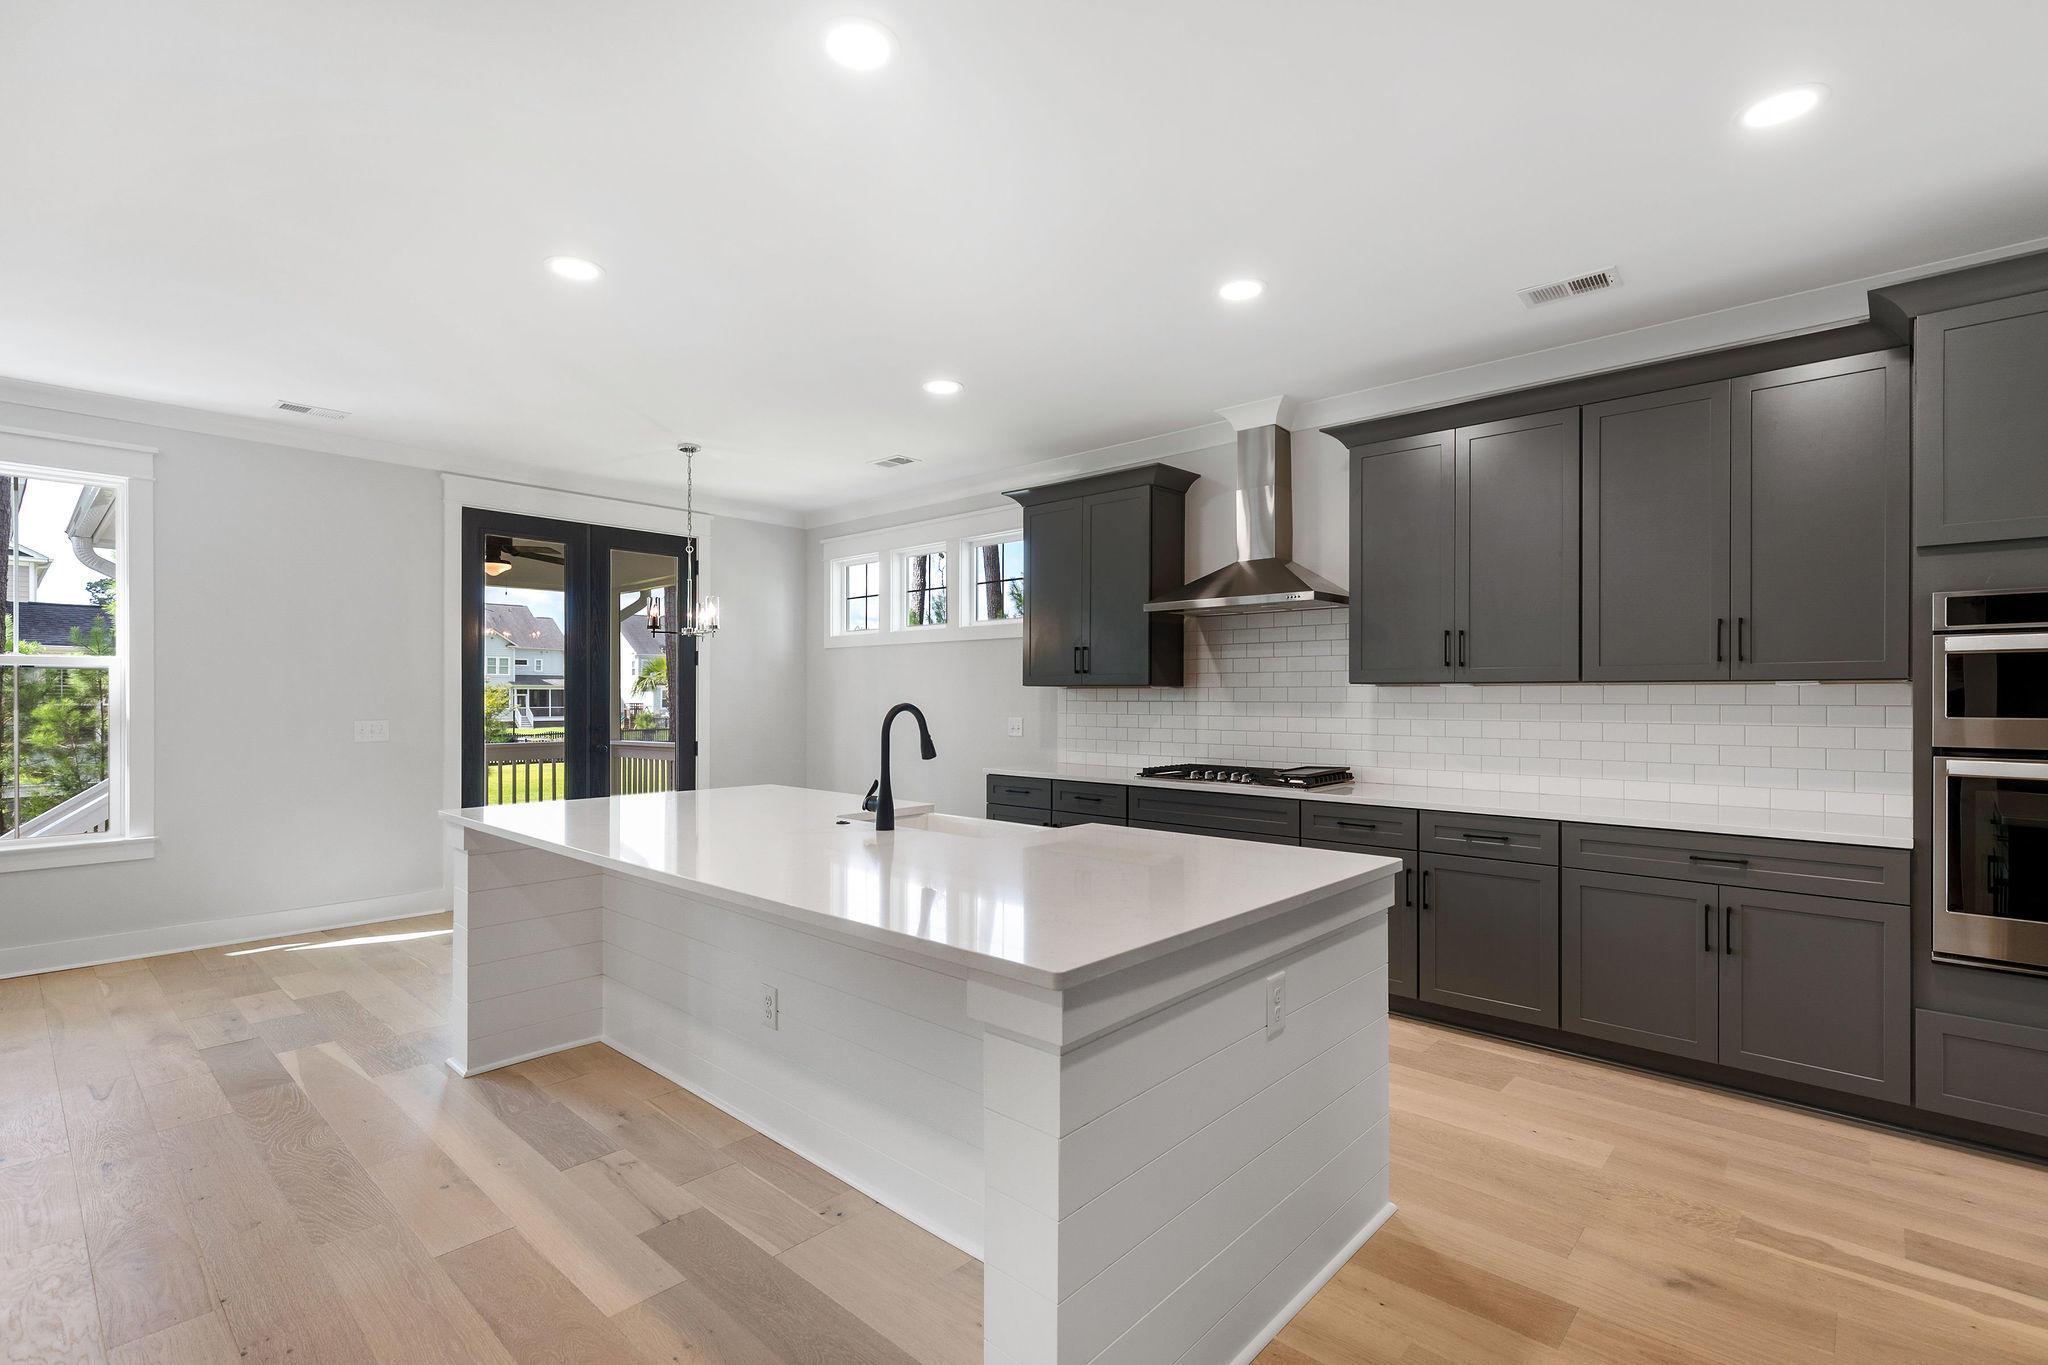 Park West Homes For Sale - 2291 Middlesex, Mount Pleasant, SC - 54